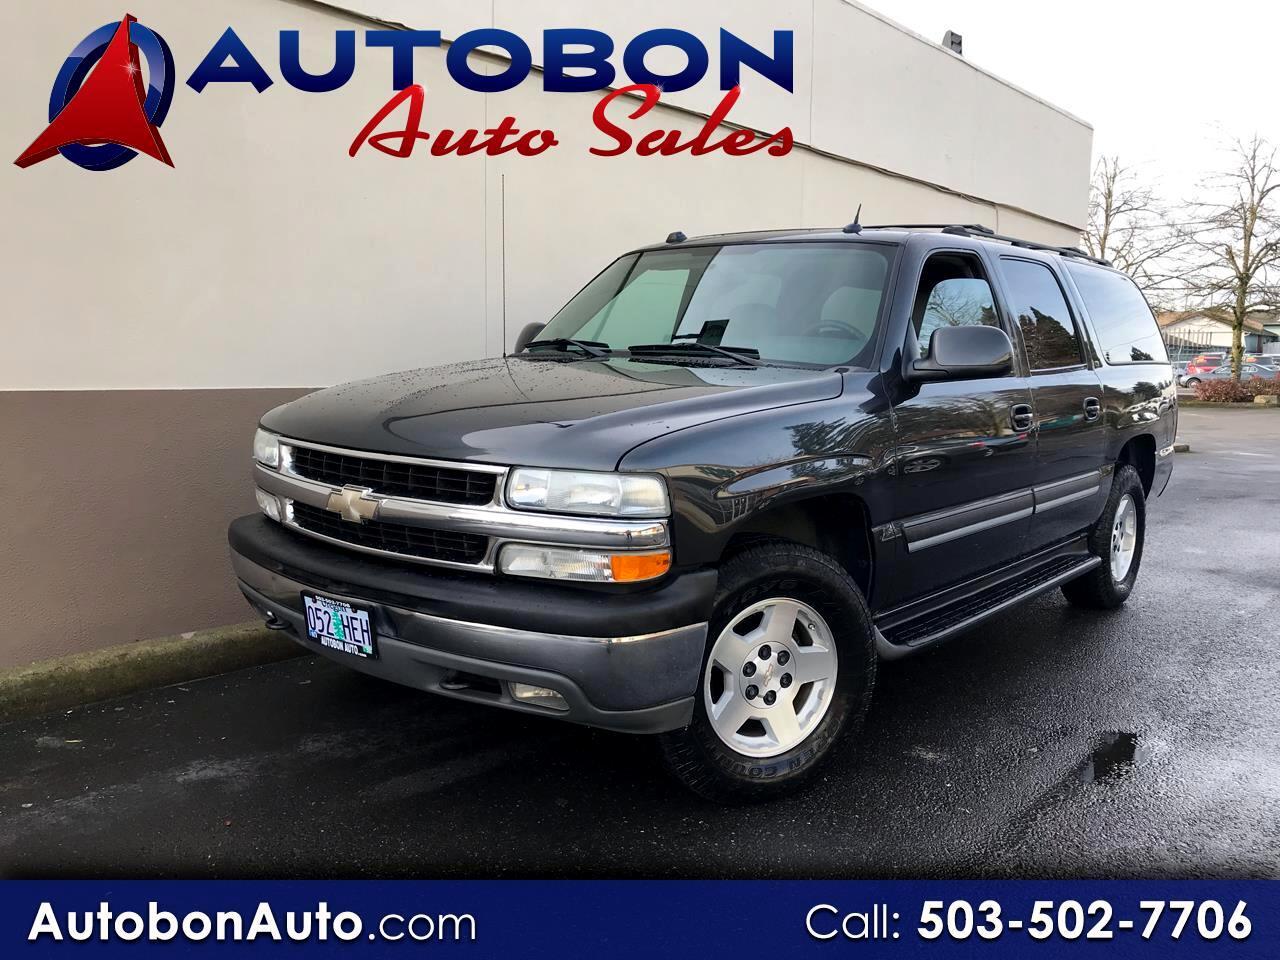 2004 Chevrolet Suburban 4dr 1500 4WD LT